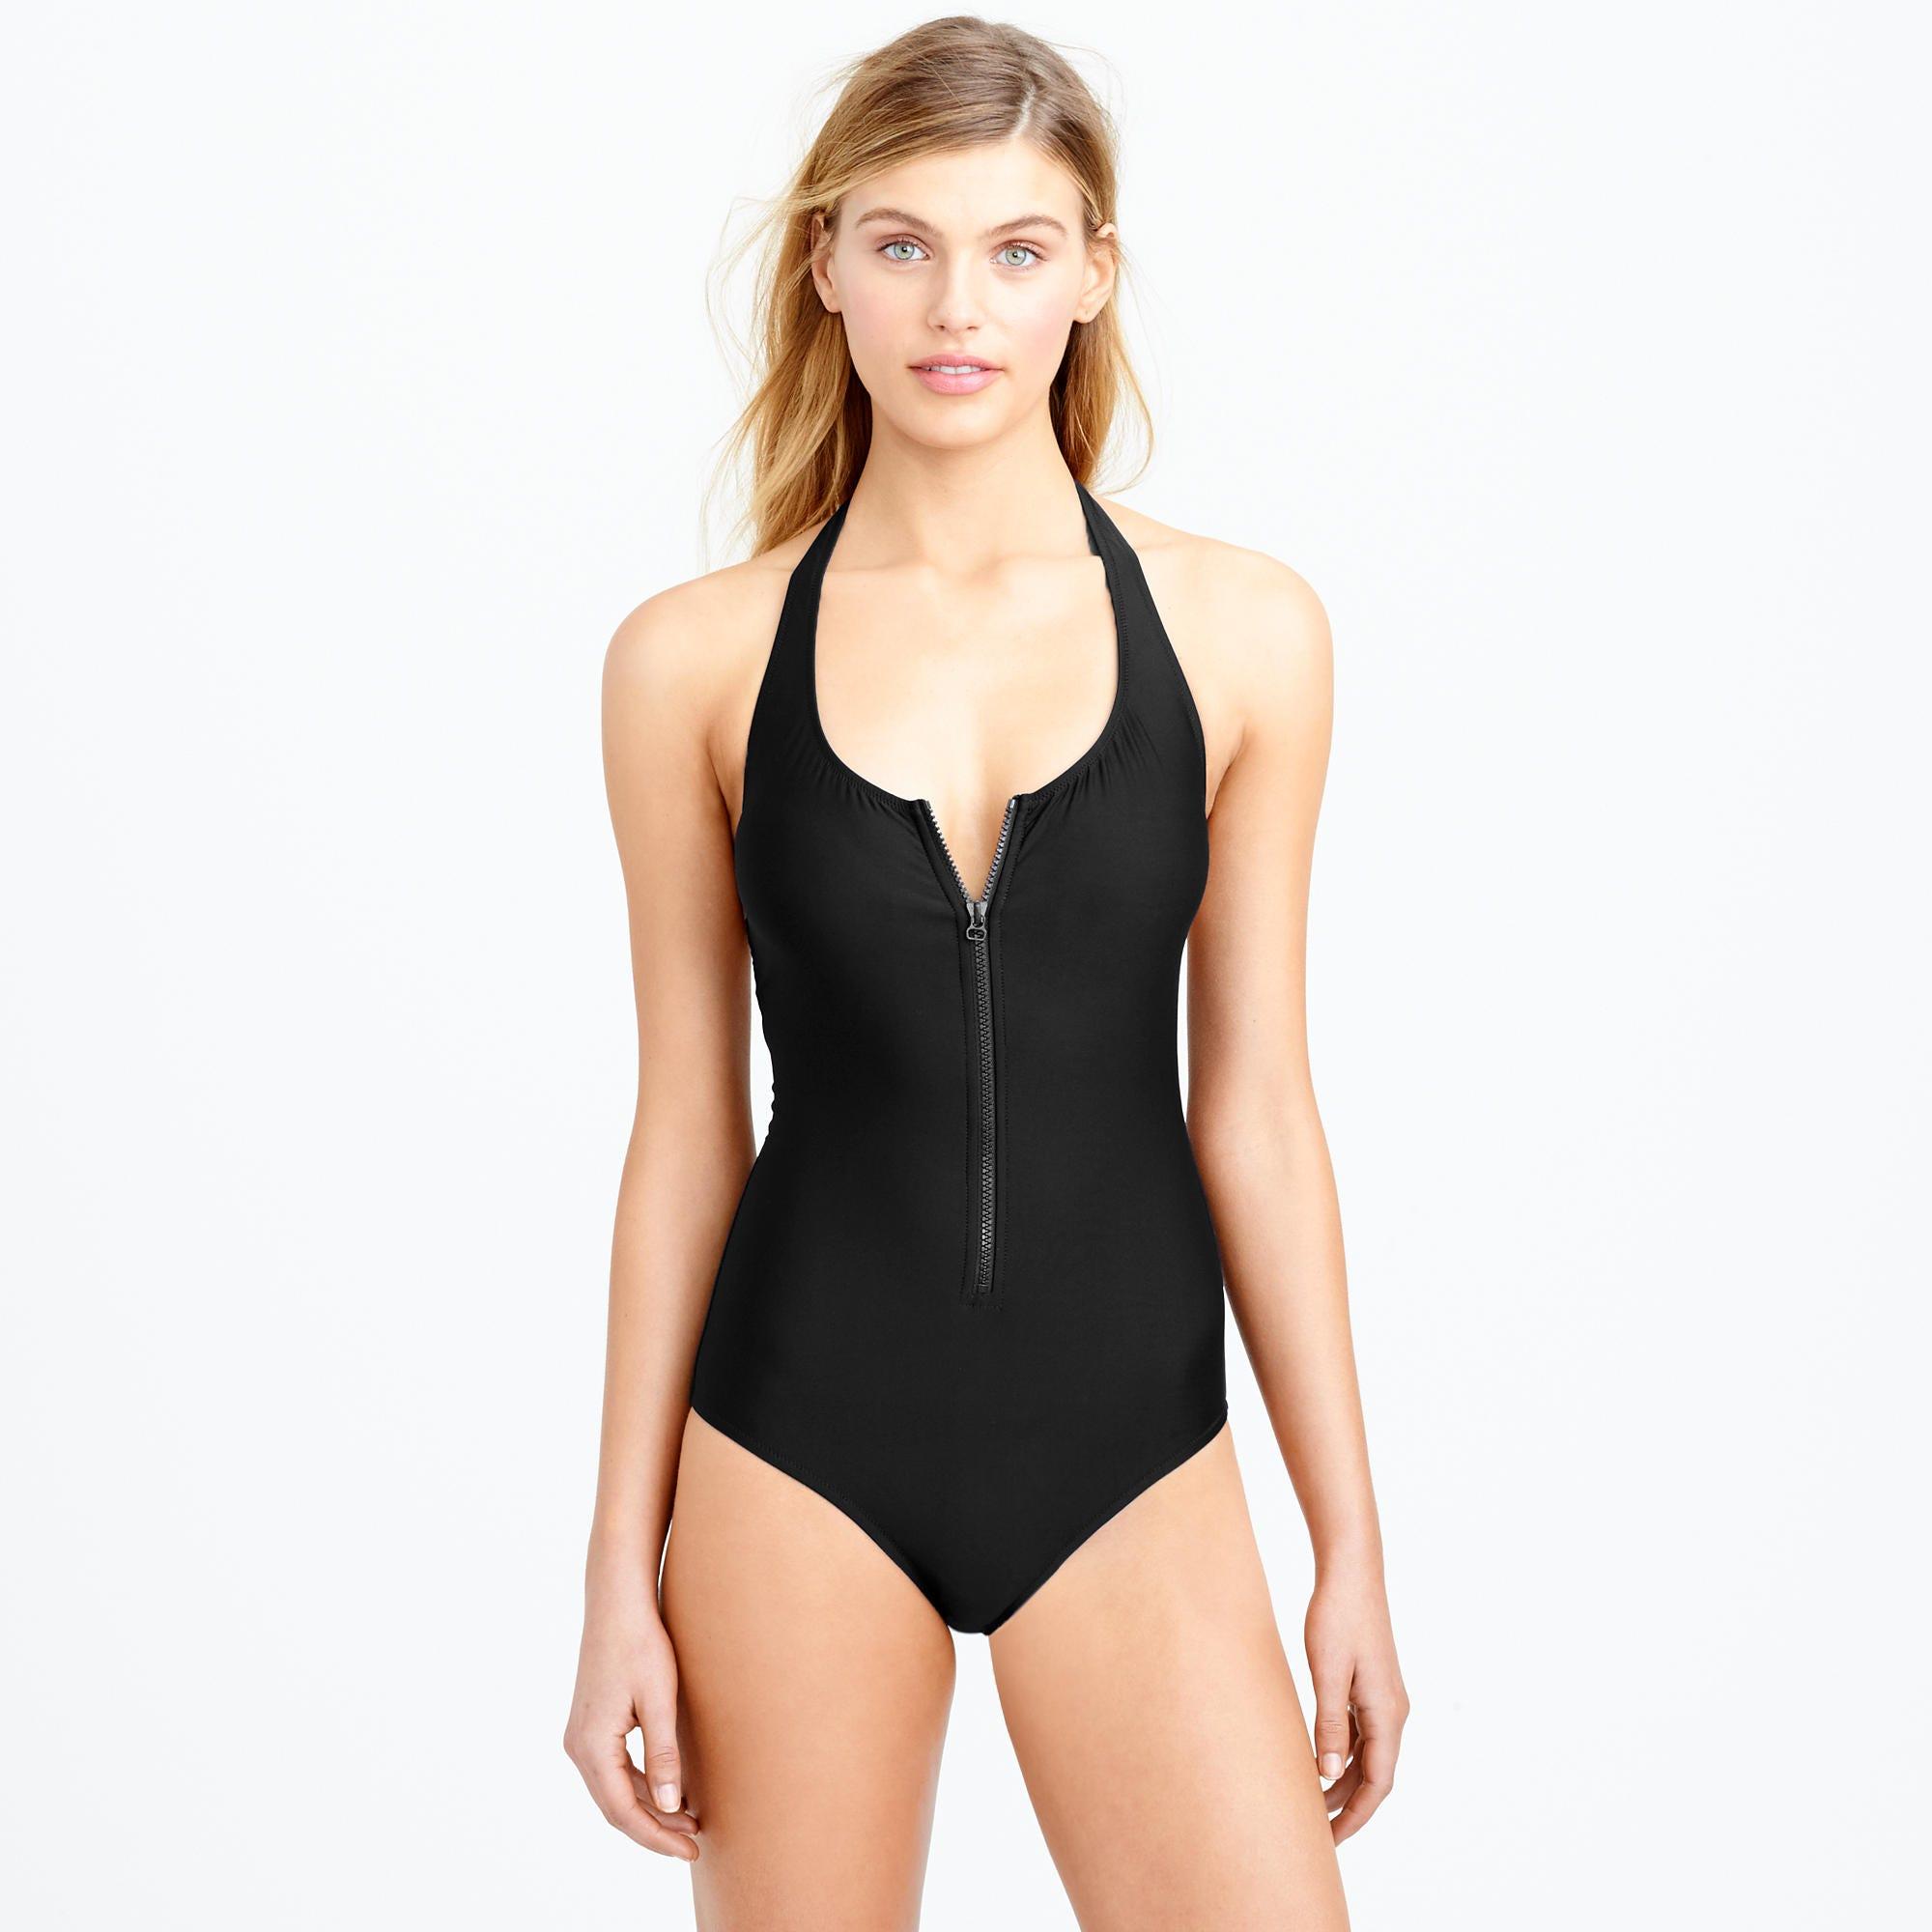 4cca264e7e255 J.Crew. Zip -front One-piece Swimsuit